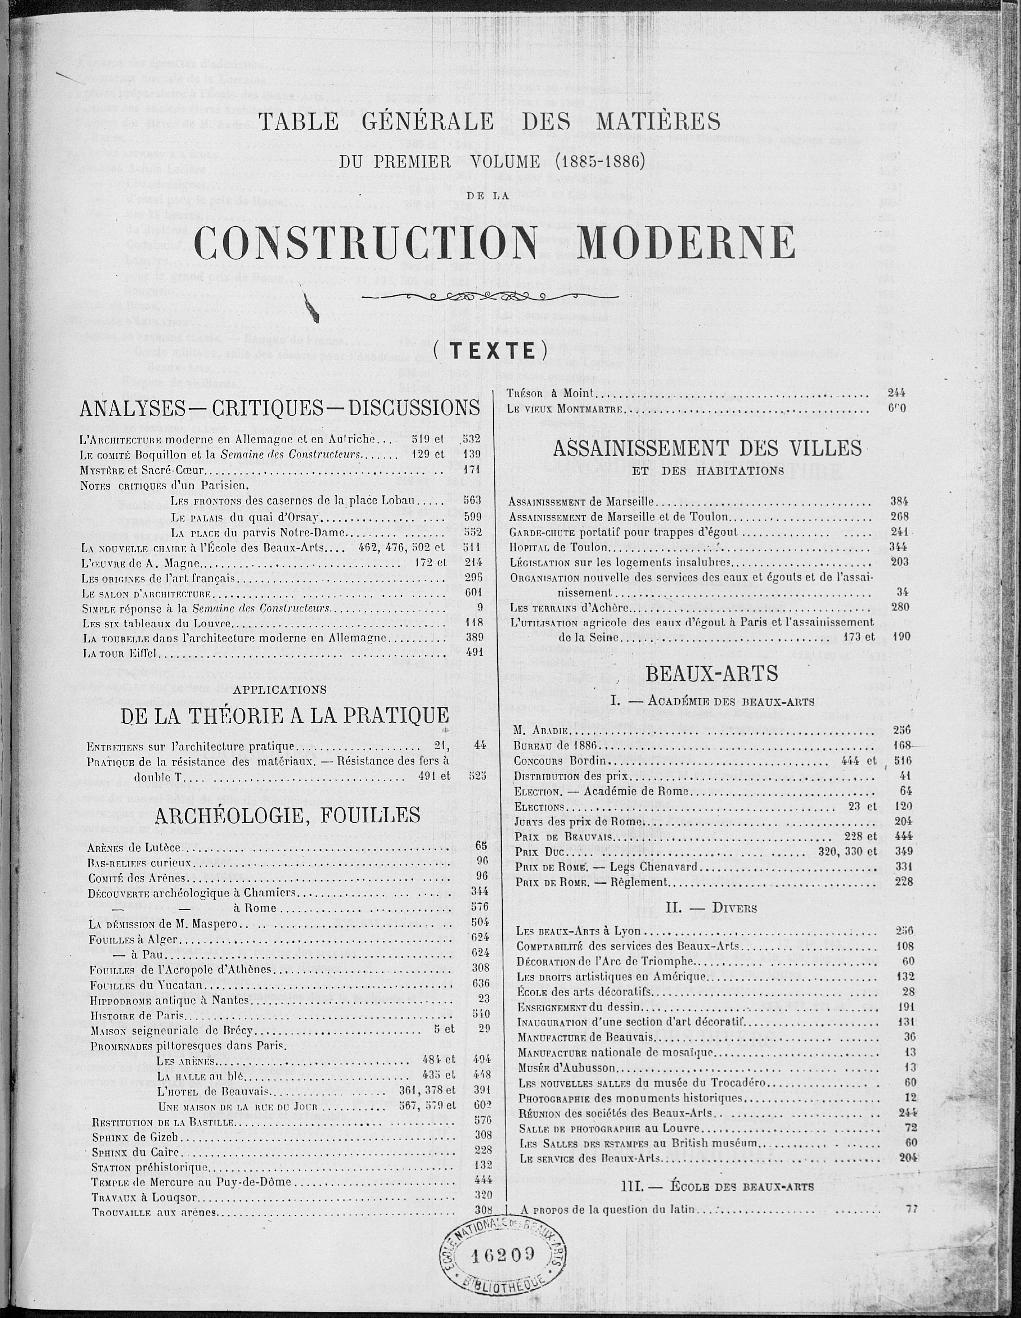 La Construction moderne, Index, 1885-1886 |